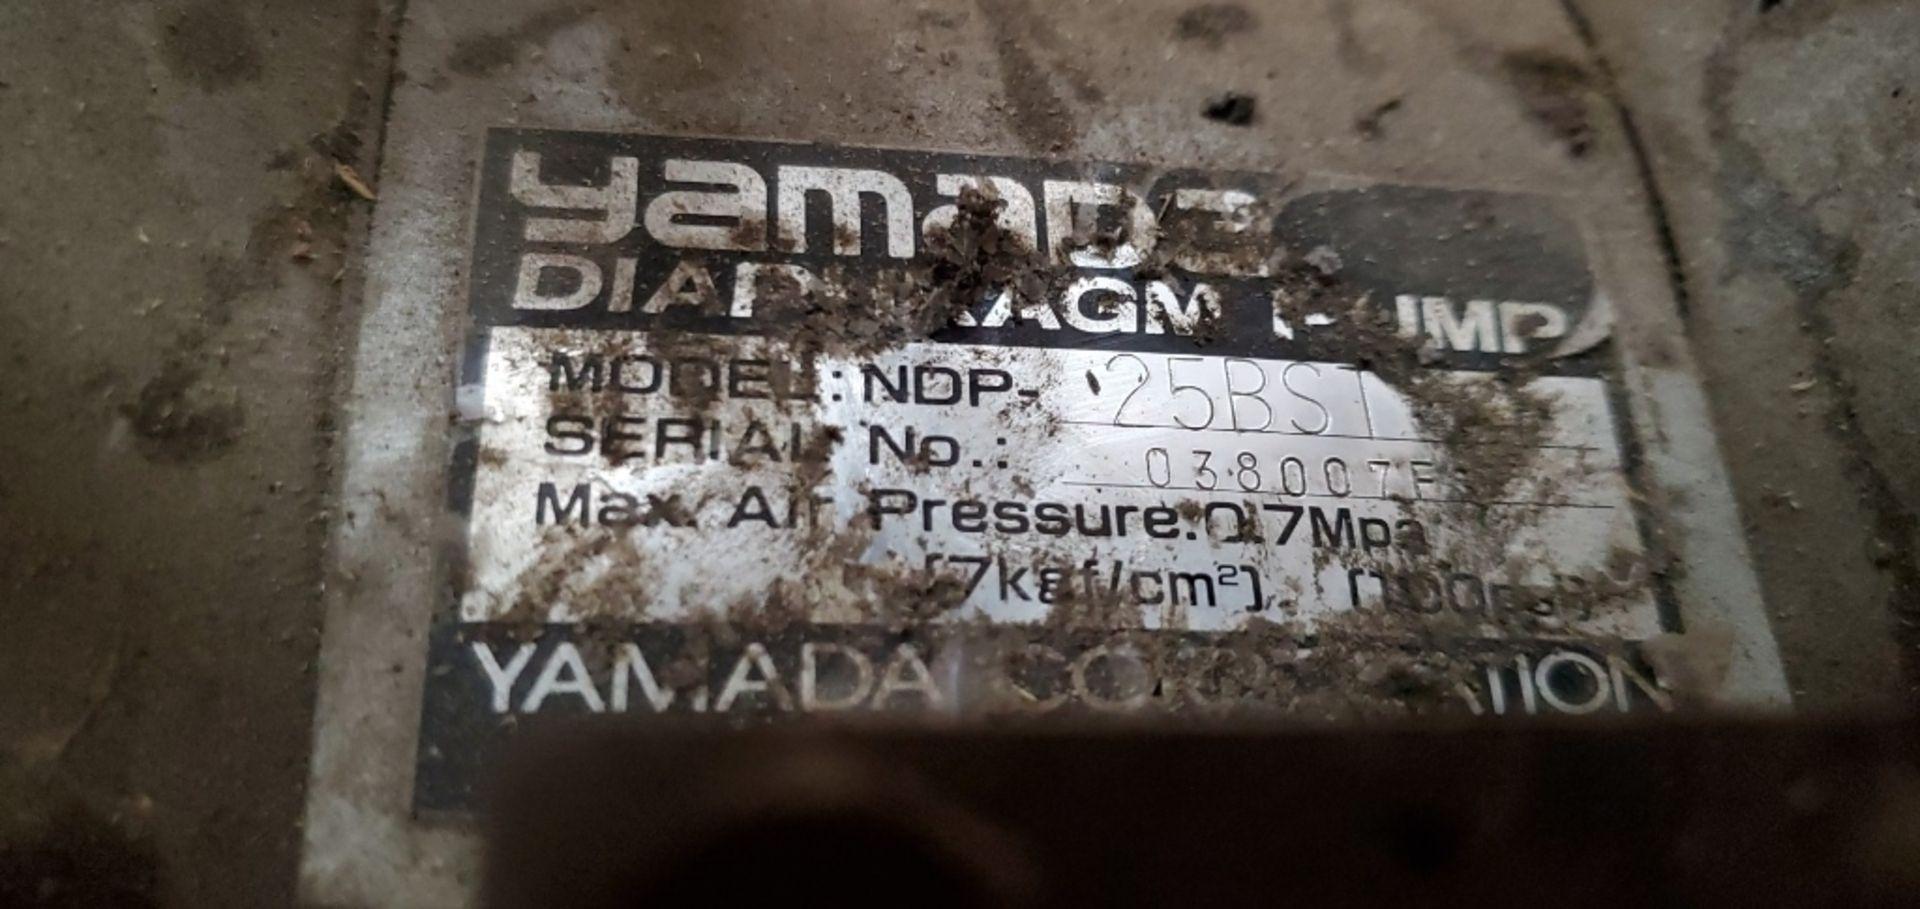 Yamada Model NDP25BS 6 Diaphragm Pump - Image 4 of 4